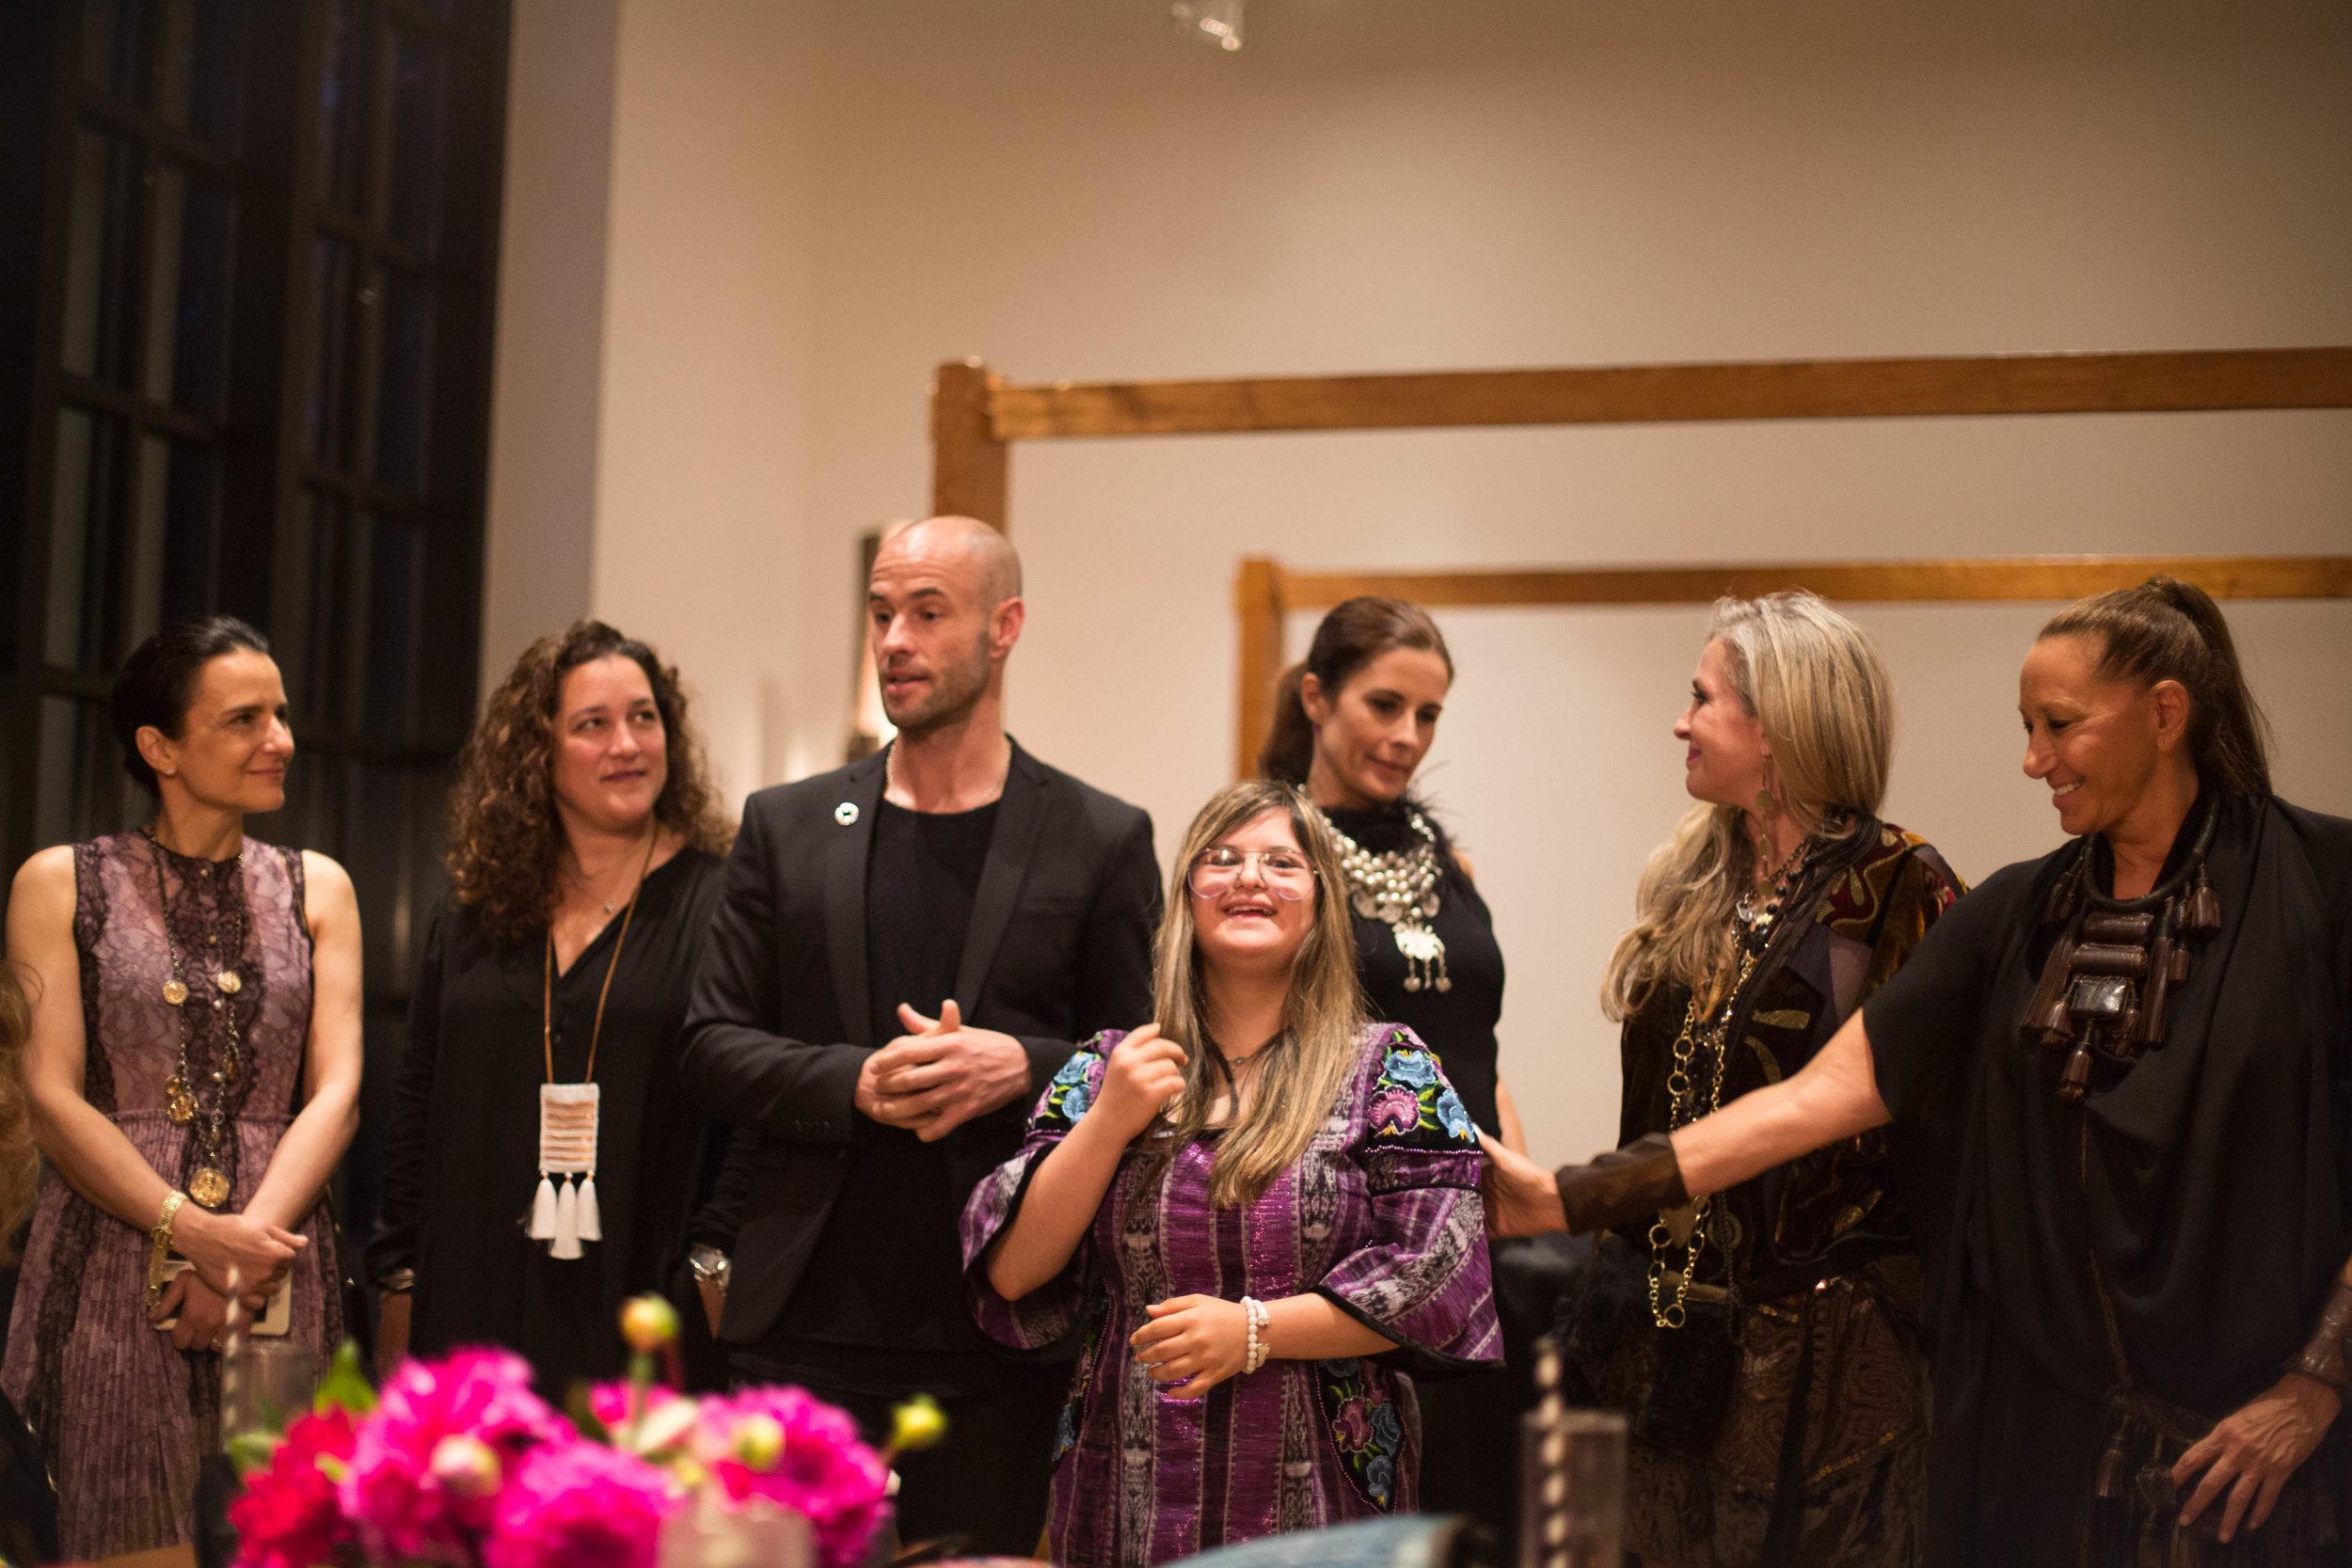 L-R: Marianne Hernandez, Celina de Sola, Cameron Saul, Isabella Springmuhl, Livia Firth, Carmen Busquets, Donna Karan / Photo: Charlie Johnson.